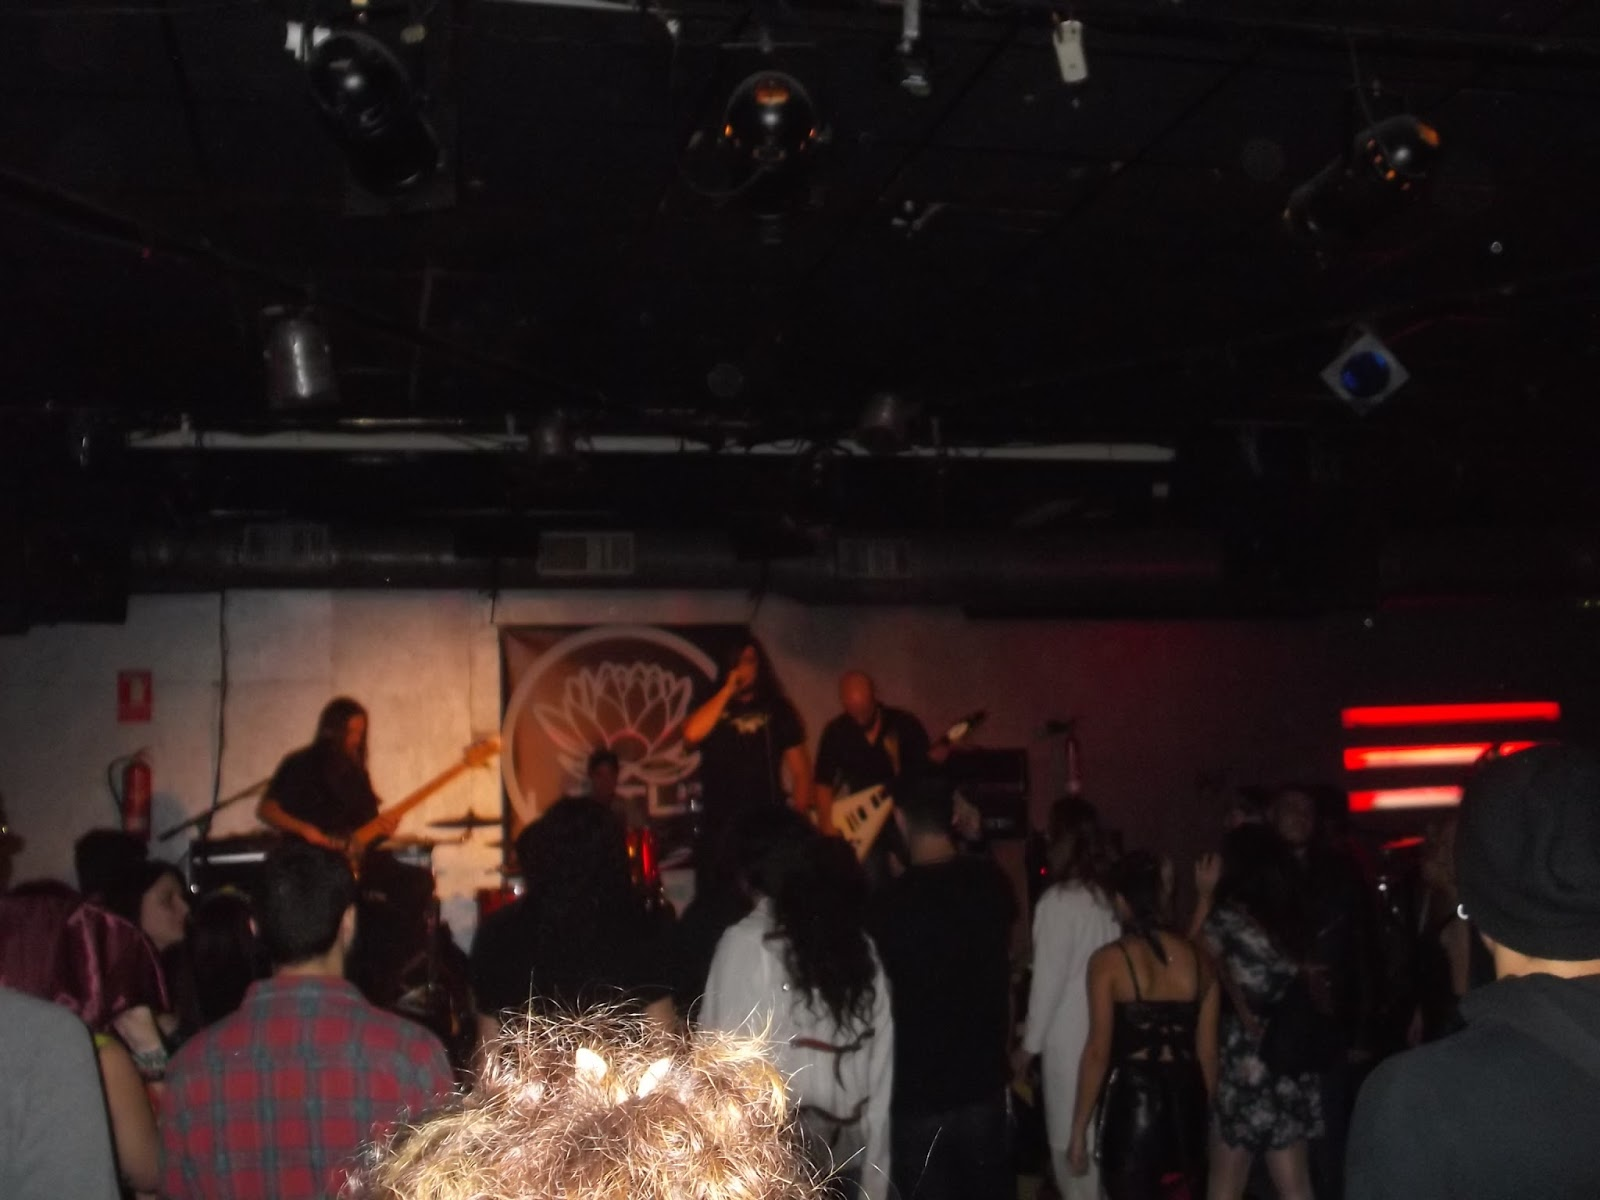 Blog de m sica g tica rock j music heavy metal for Sala malandar